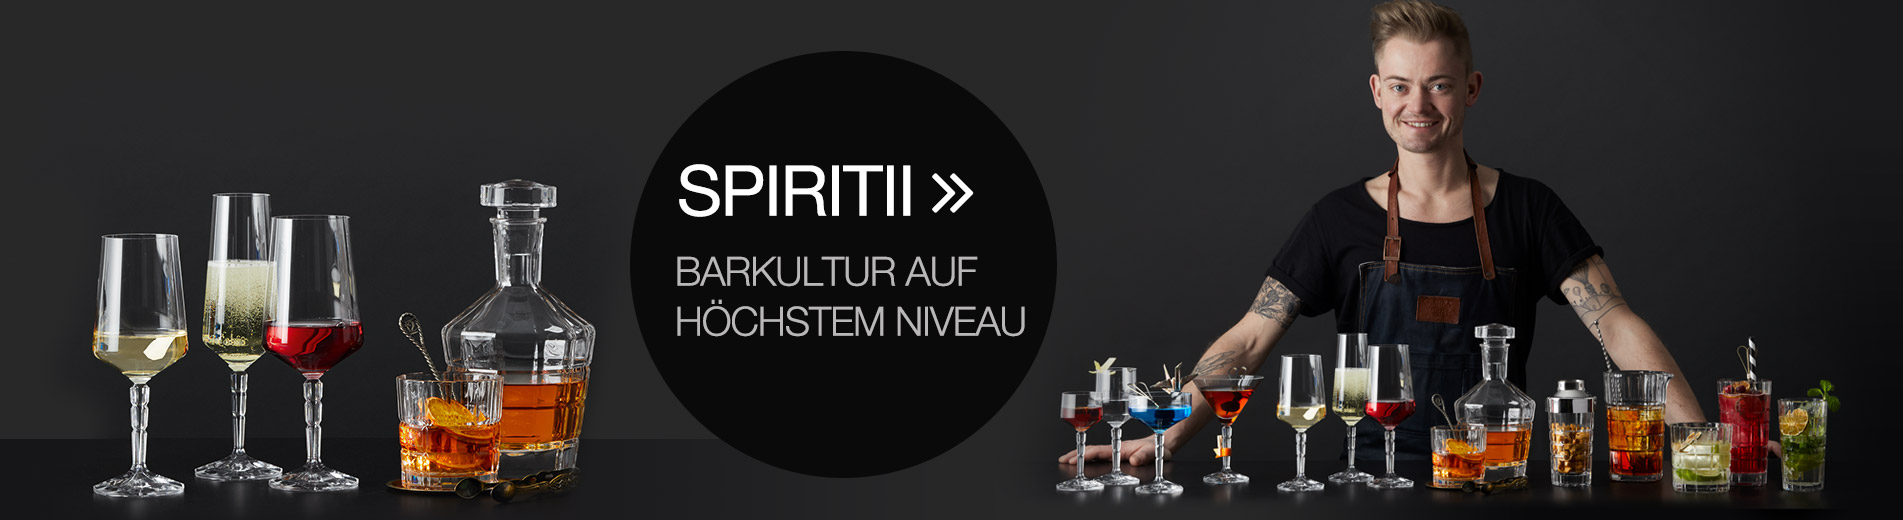 Spiritii